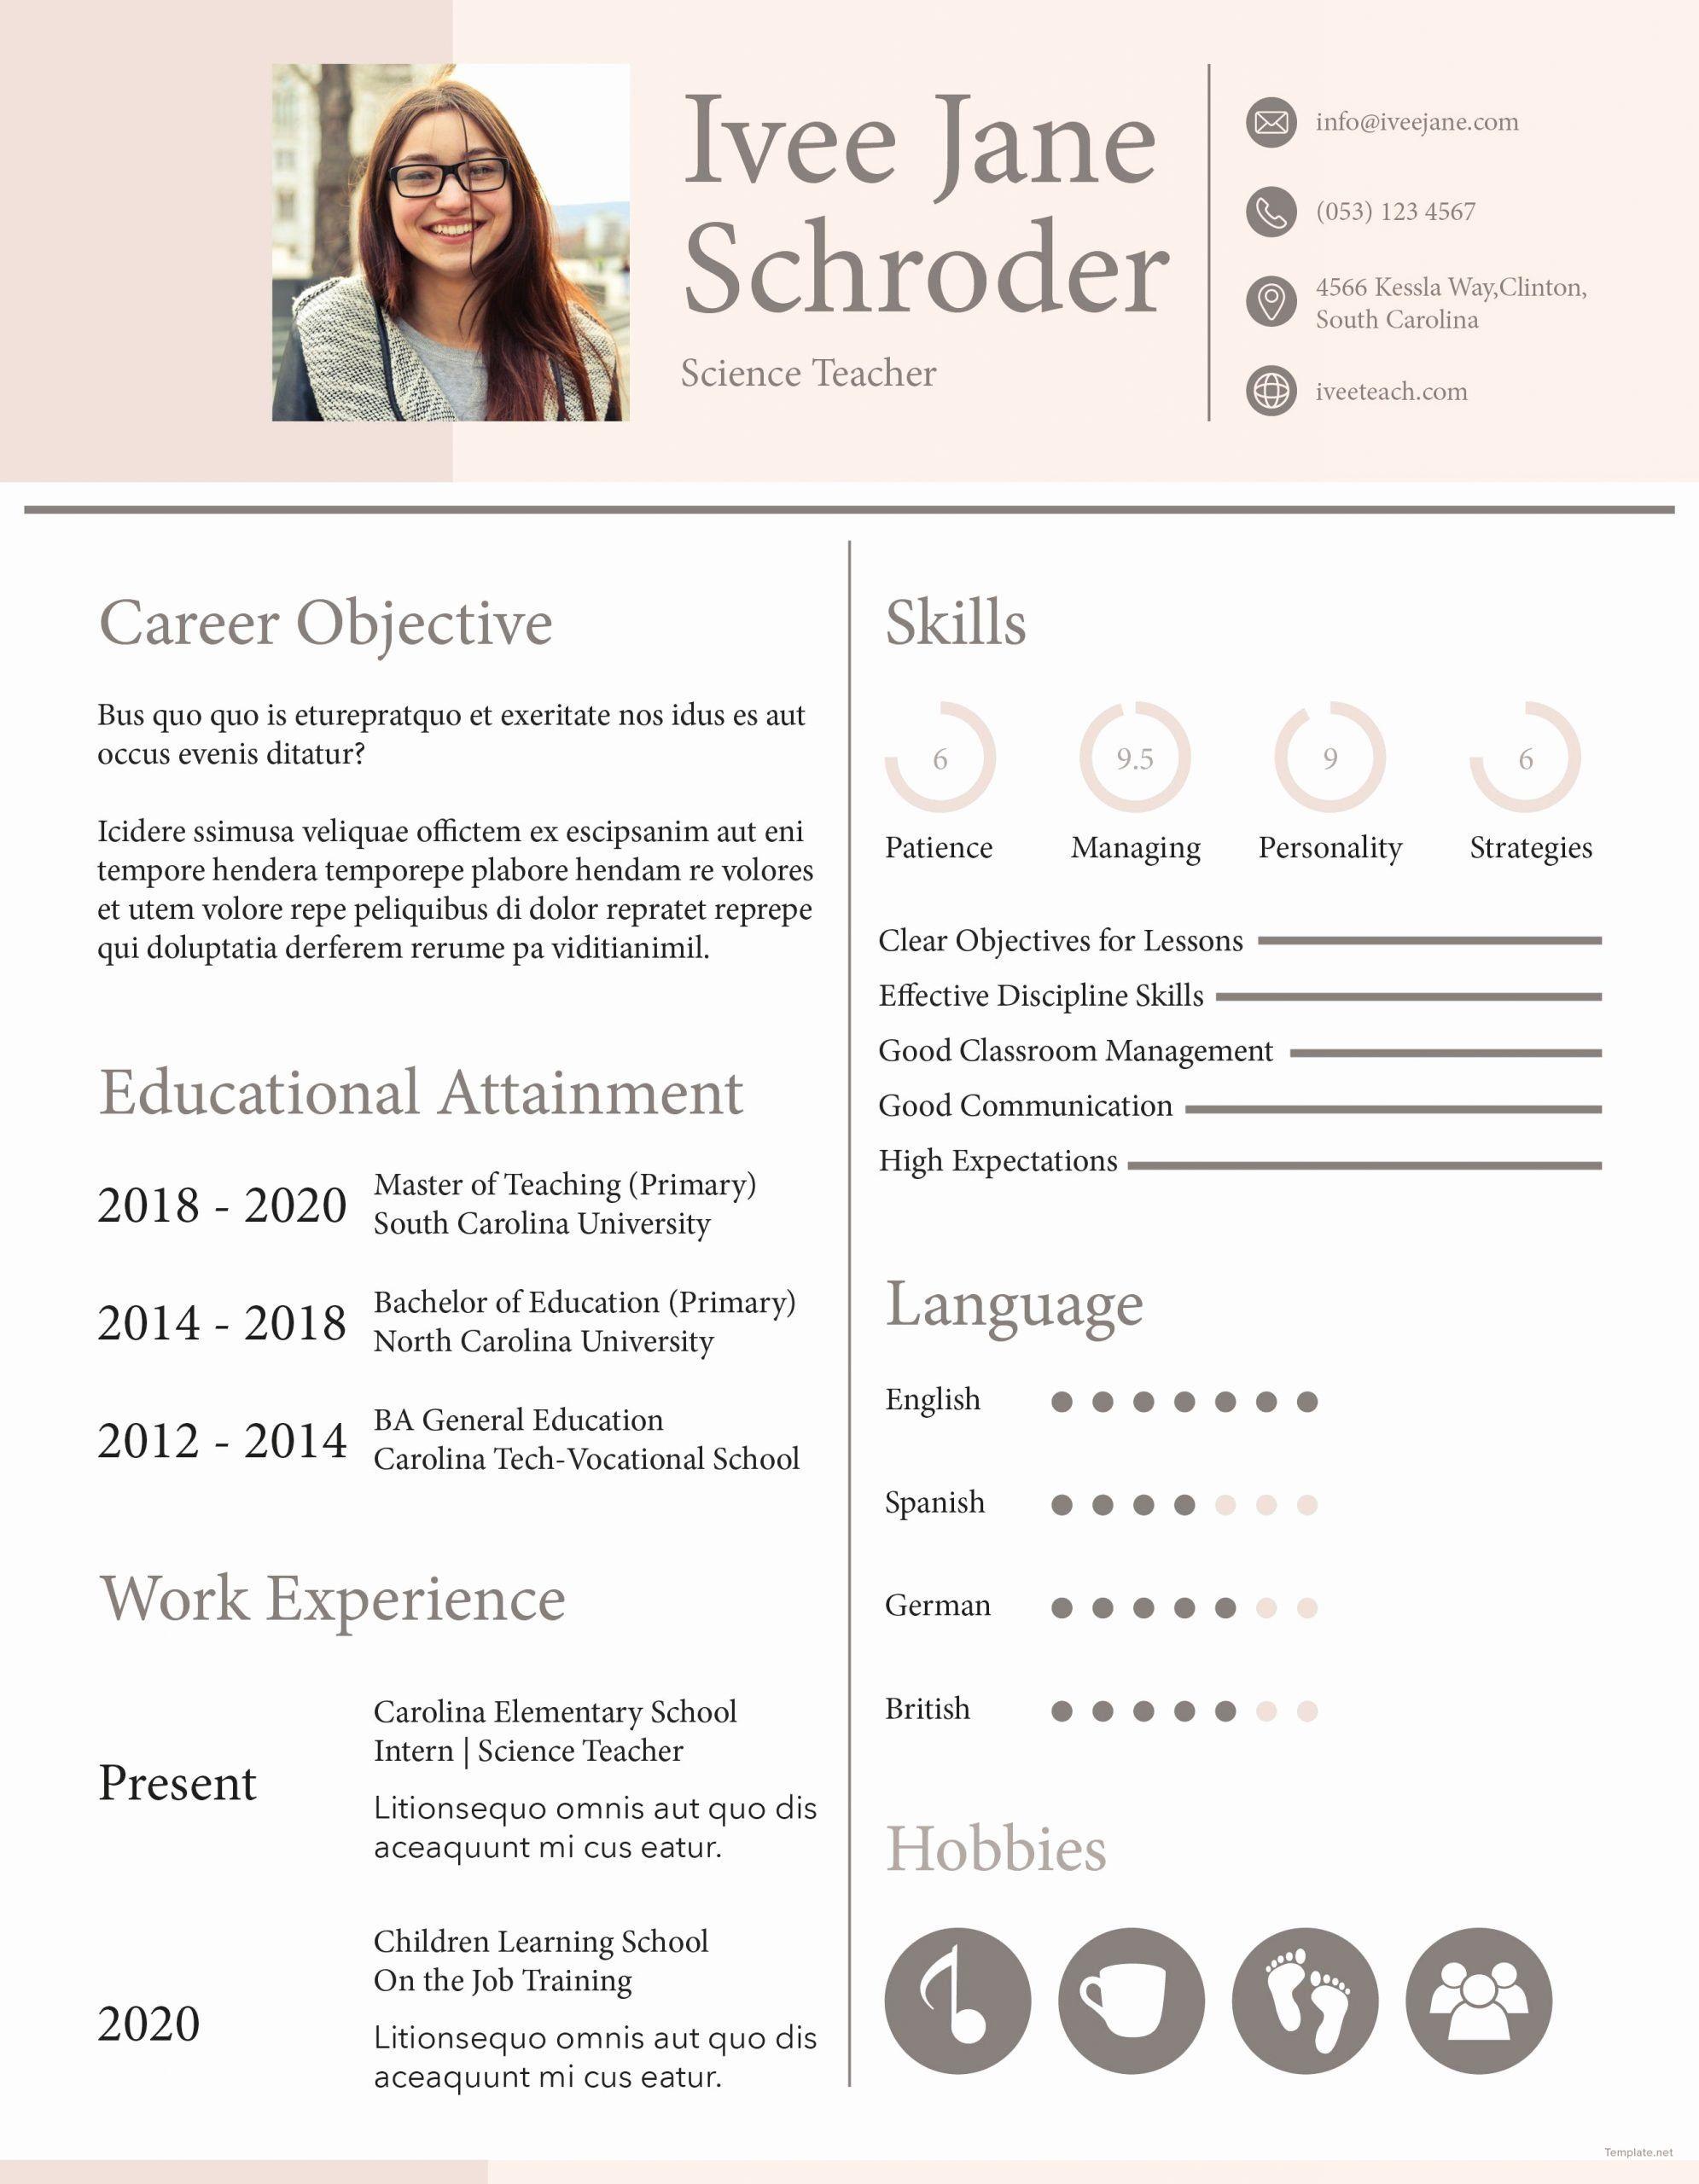 Teacher Resume Examples 2020 Luxury Teaching Resume Examples 2020 Romes Danapardaz Teacher Resume Teacher Resume Examples Teacher Resume Template